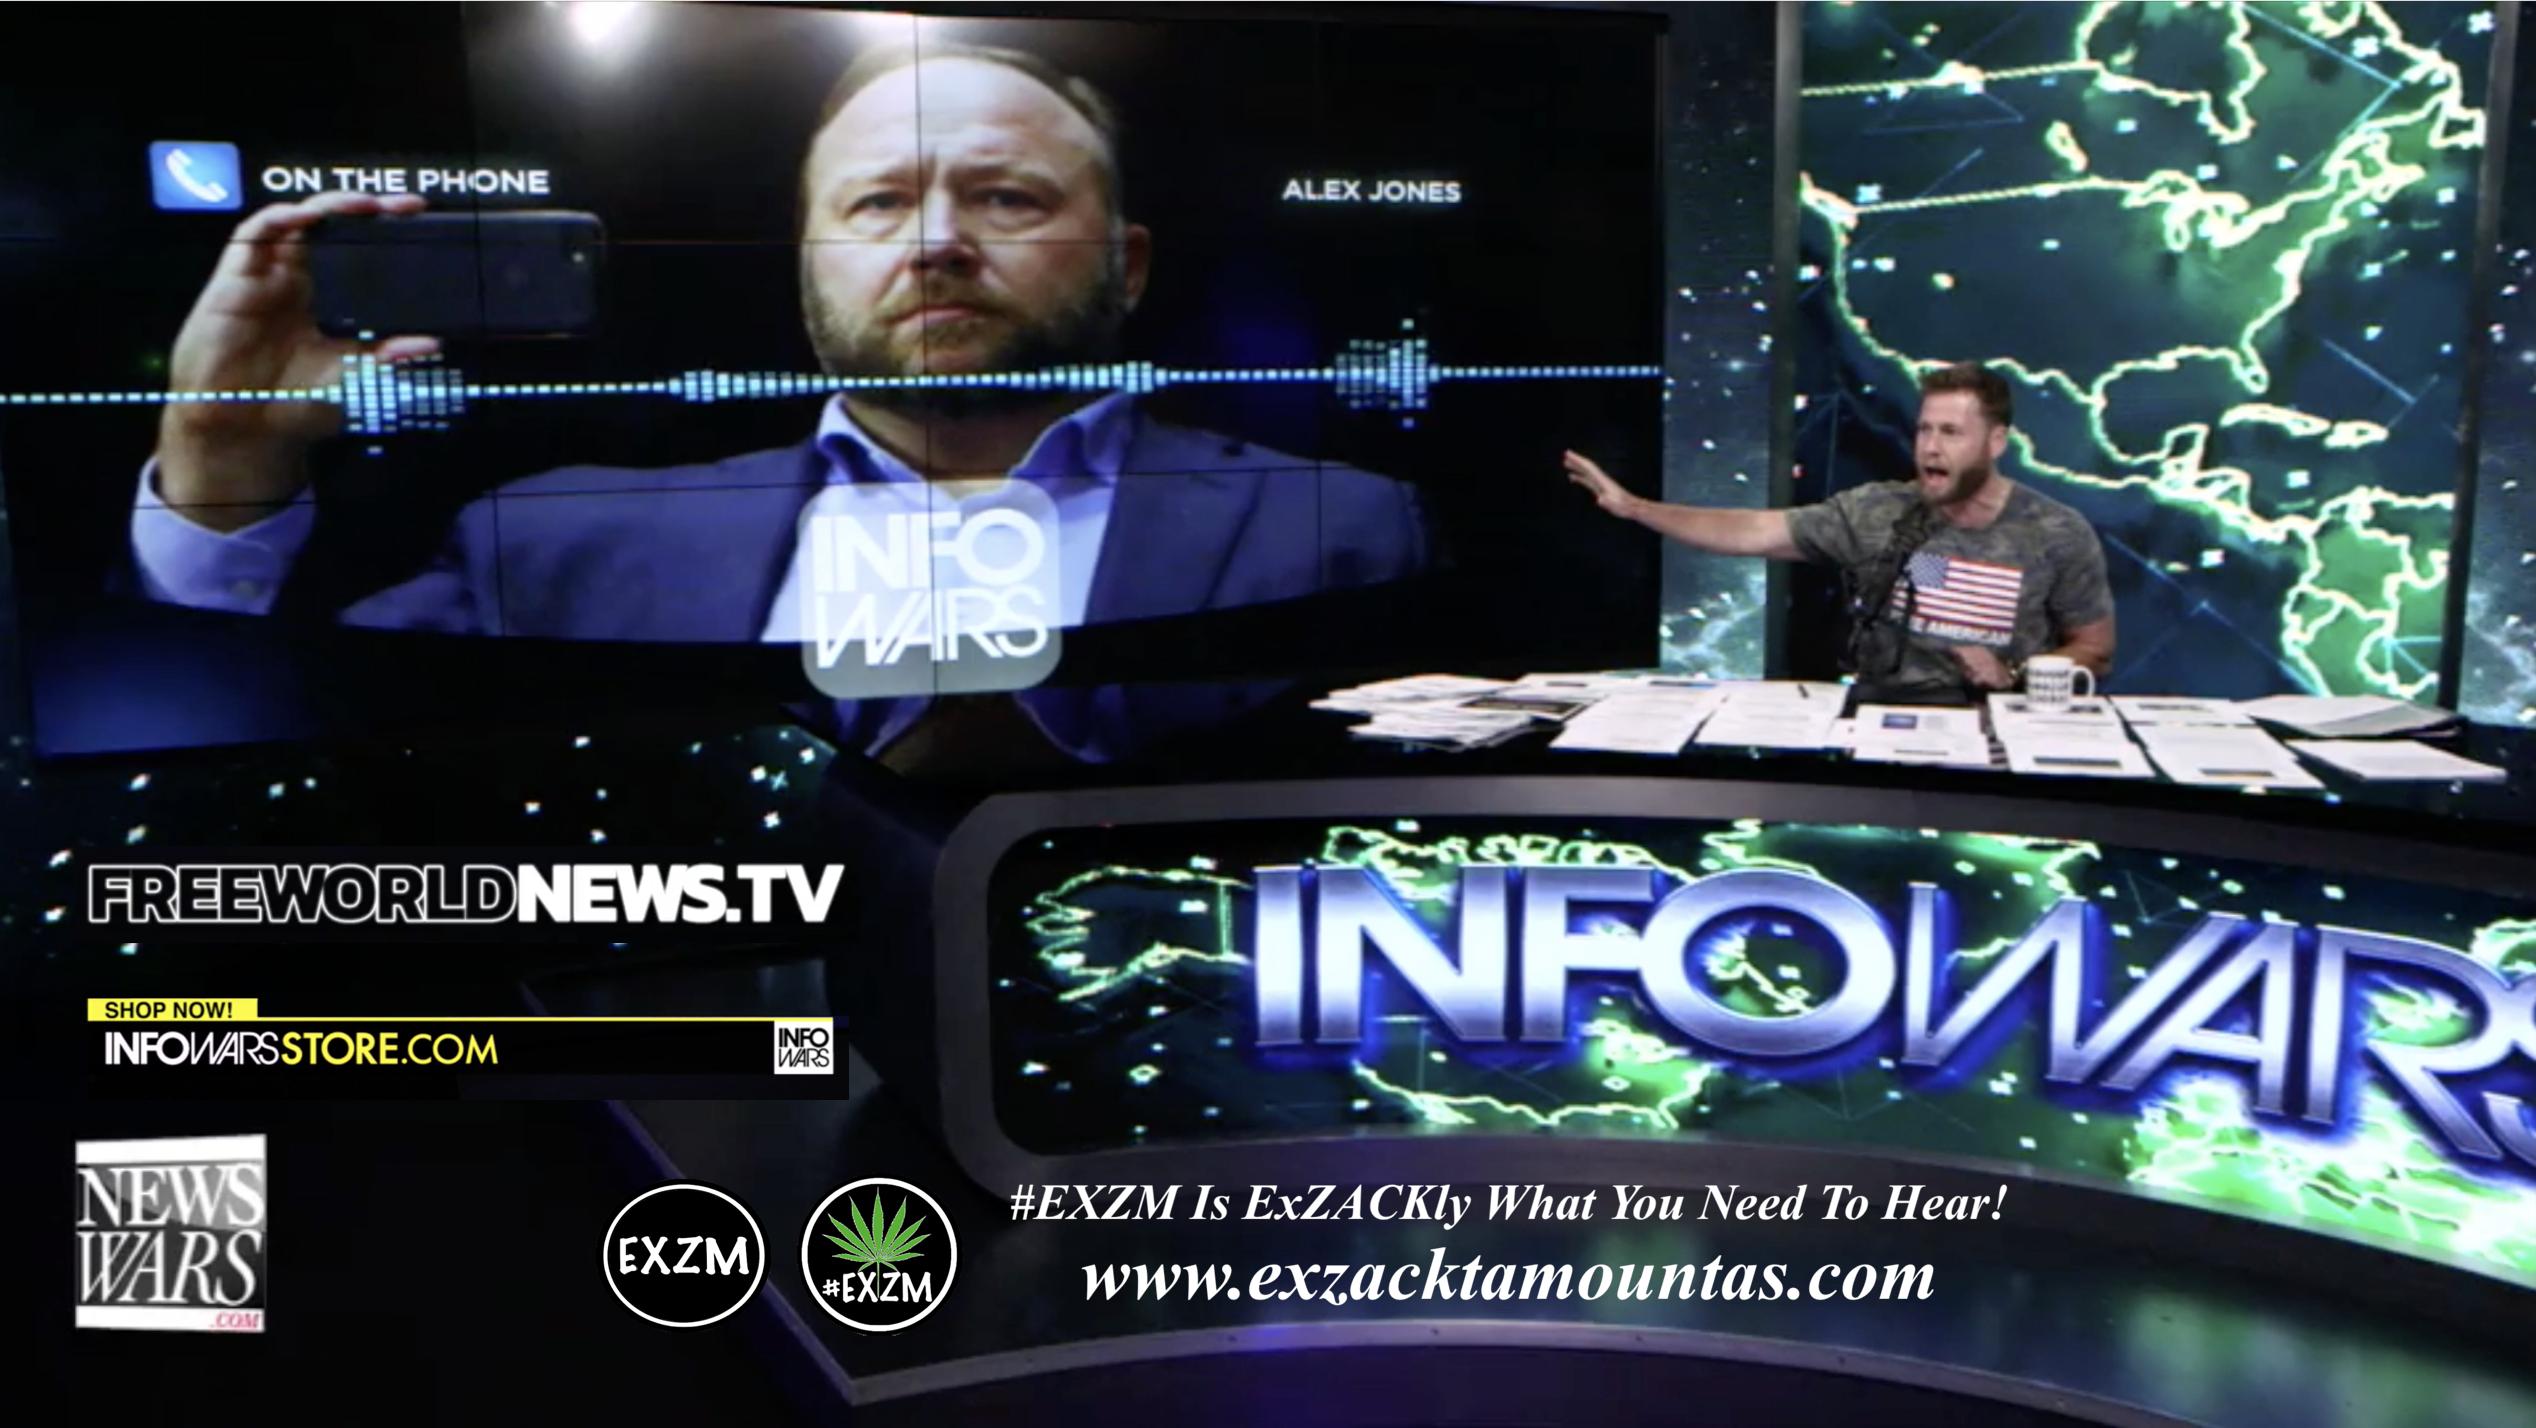 Alex Jones Owen Shroyer Live In Infowars Studio Free World News TV EXZM Zack Mount June 30th 2021 copy